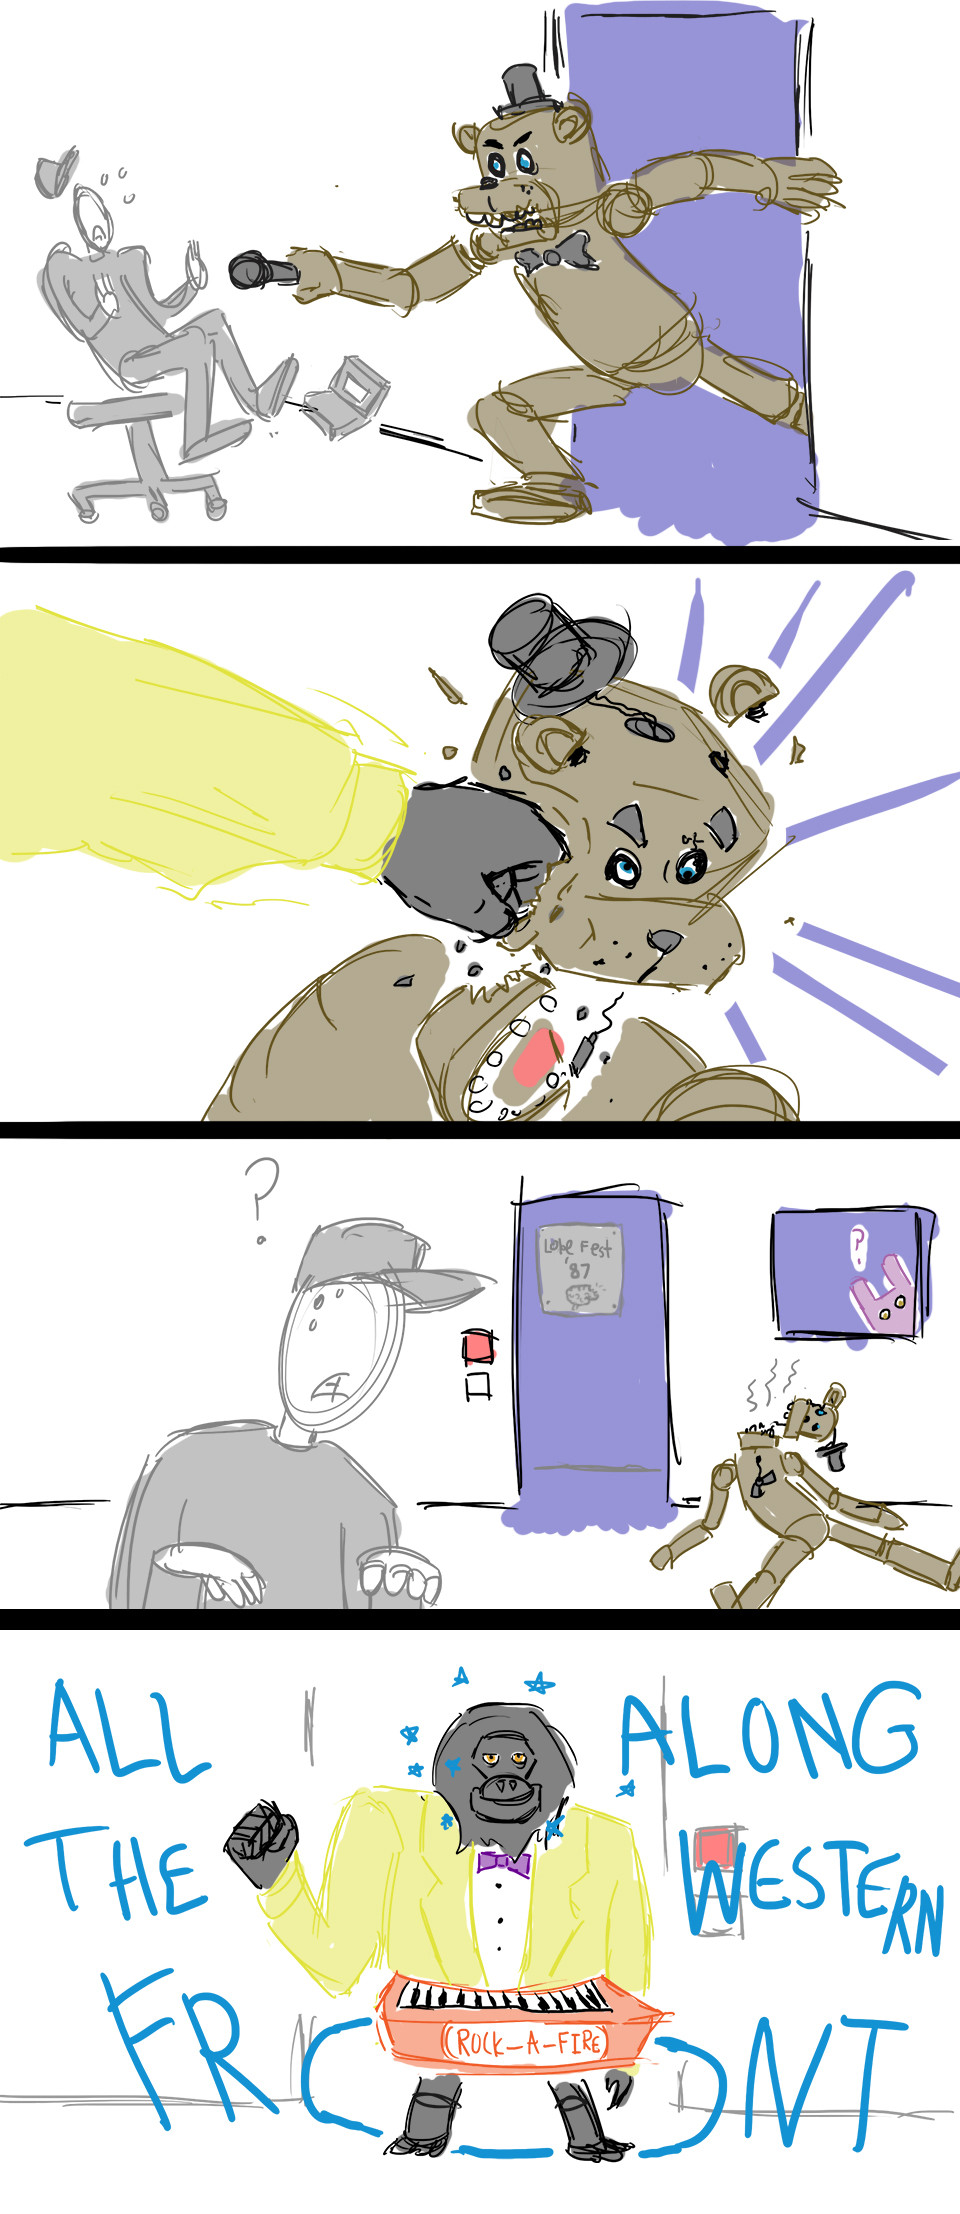 Bear Simulator Mmo | hairstylegalleries.com